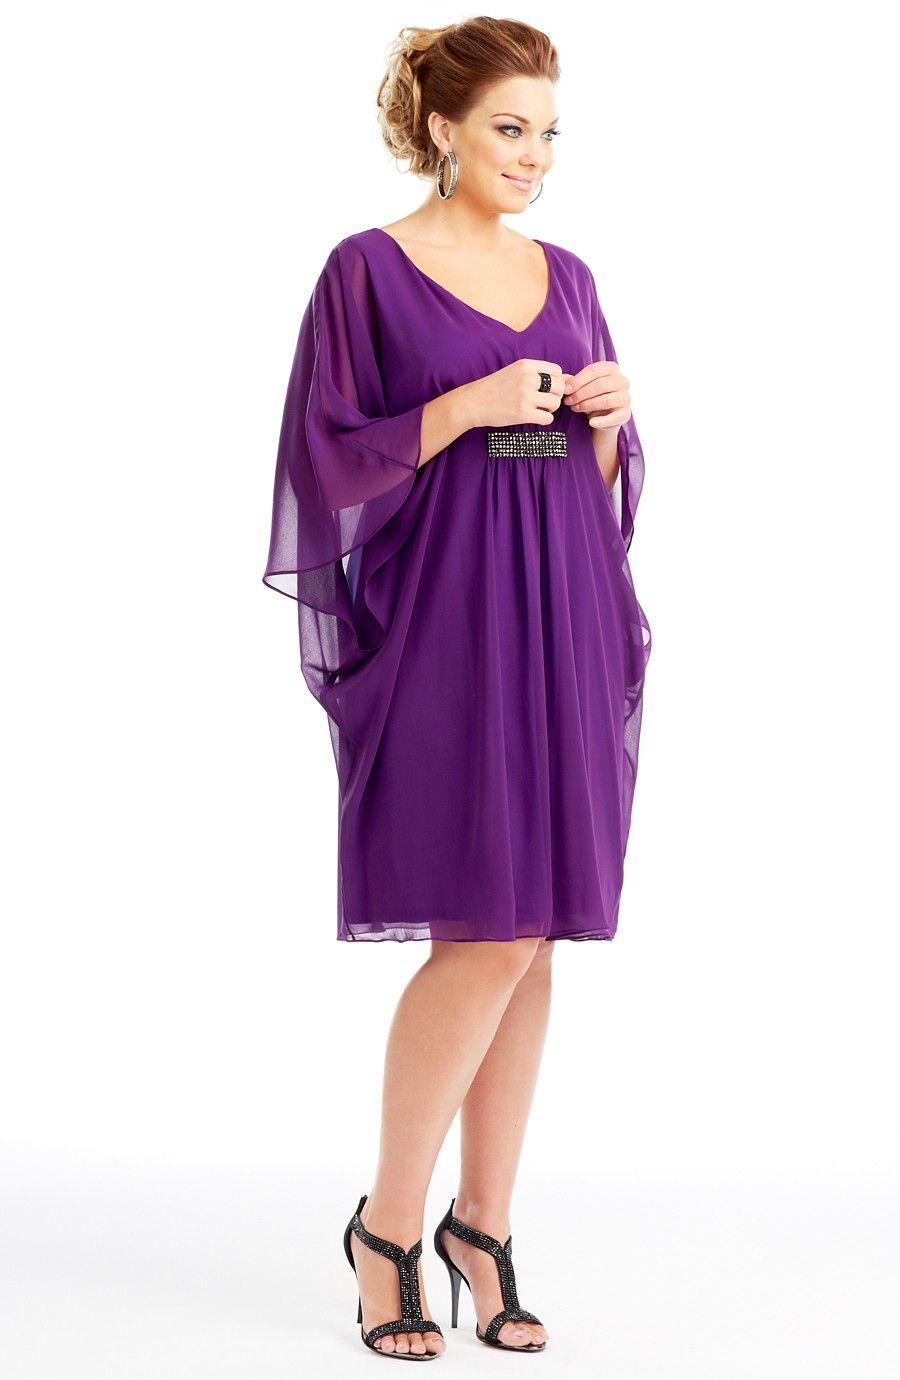 Metallic Detail Dress   Plus Size Evening Dresses - Dream Diva ...